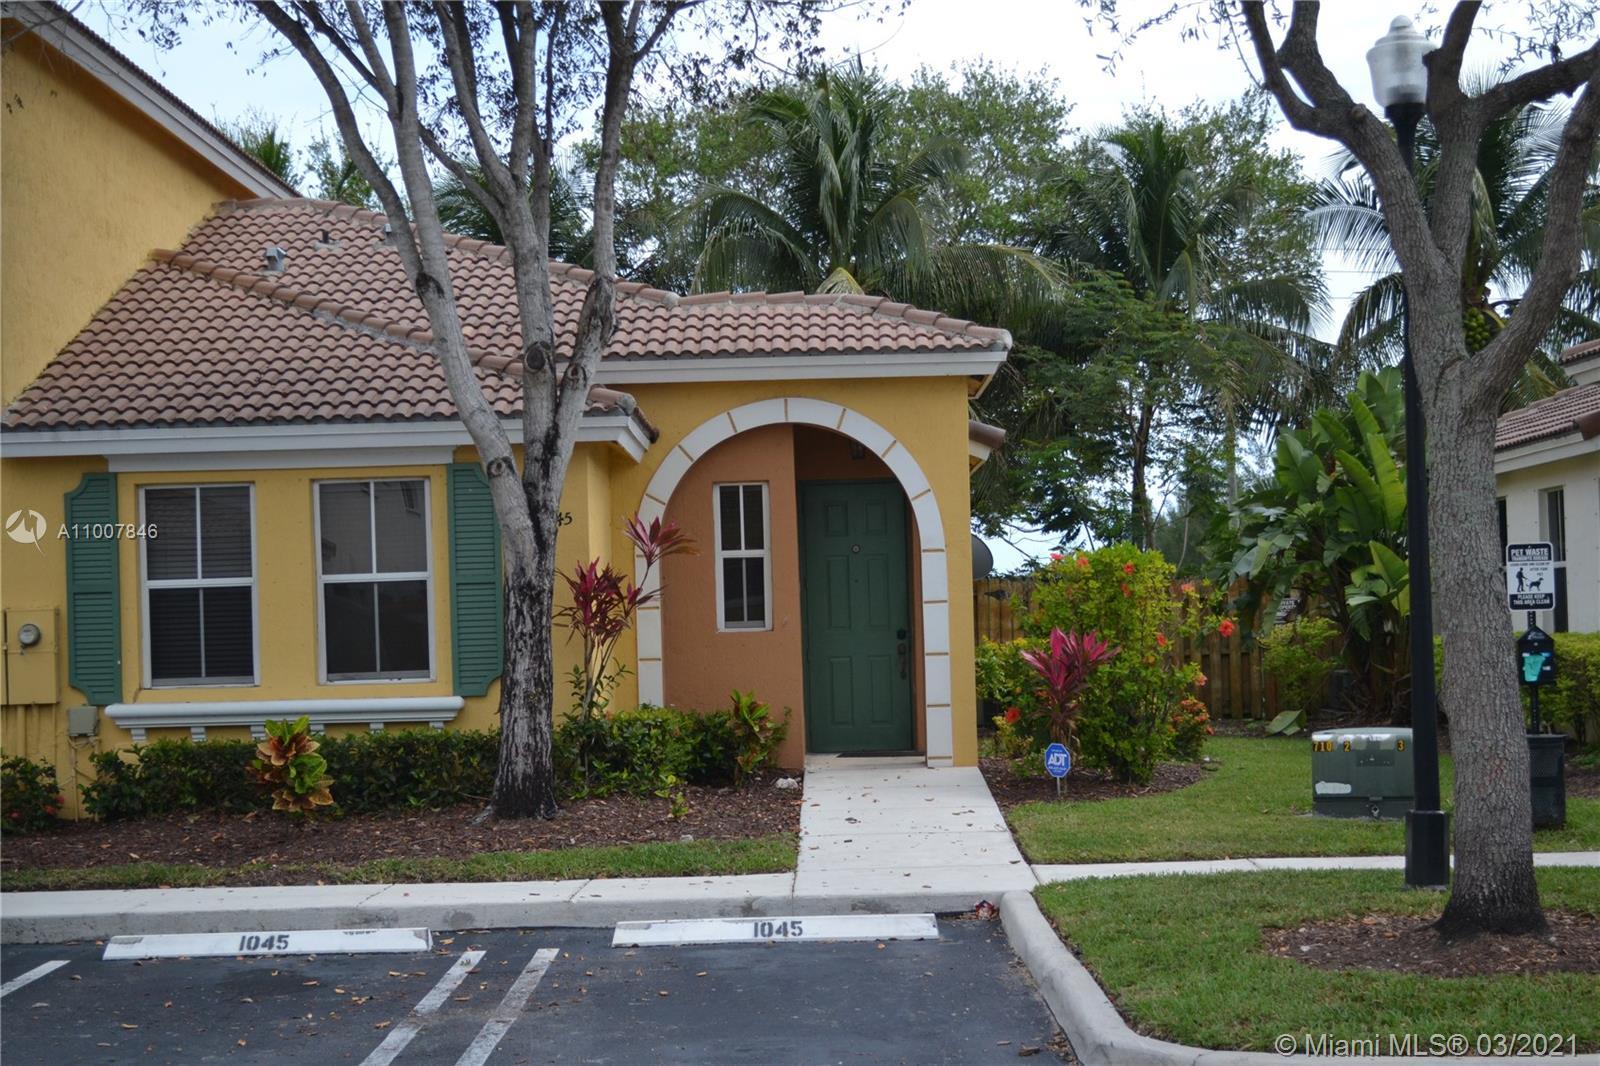 1045 NE 42 #PL Property Photo - Homestead, FL real estate listing